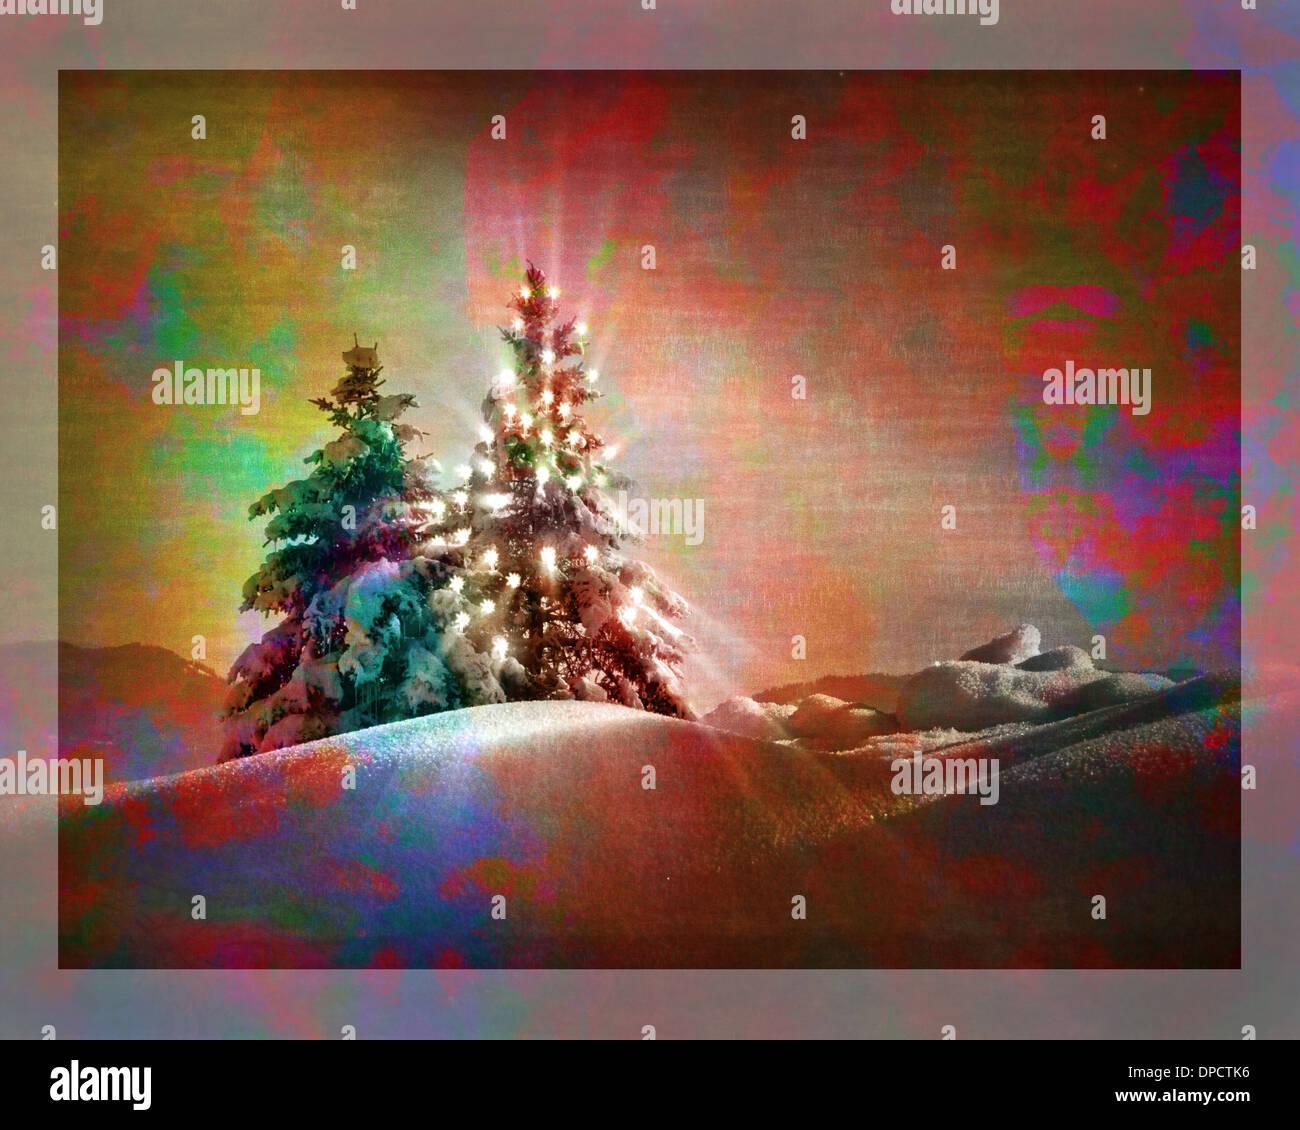 DIGITAL ART: Season's Greetings - Stock Image